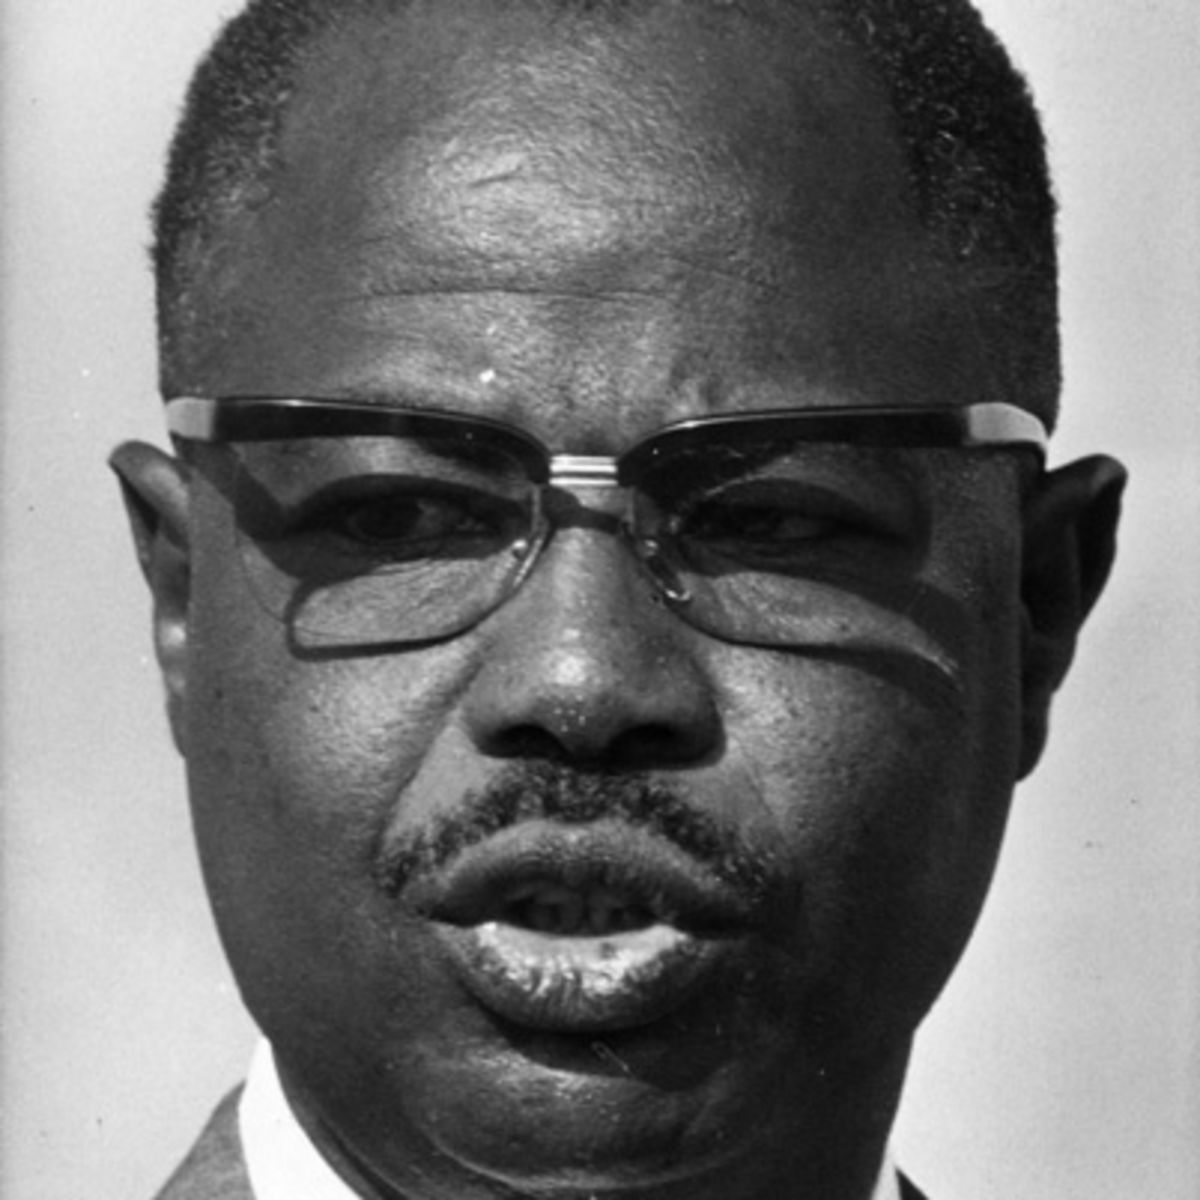 Former Cameroonian President Ahmadou Babatoura Ahidjo (Photo courtesy of Biography.com)